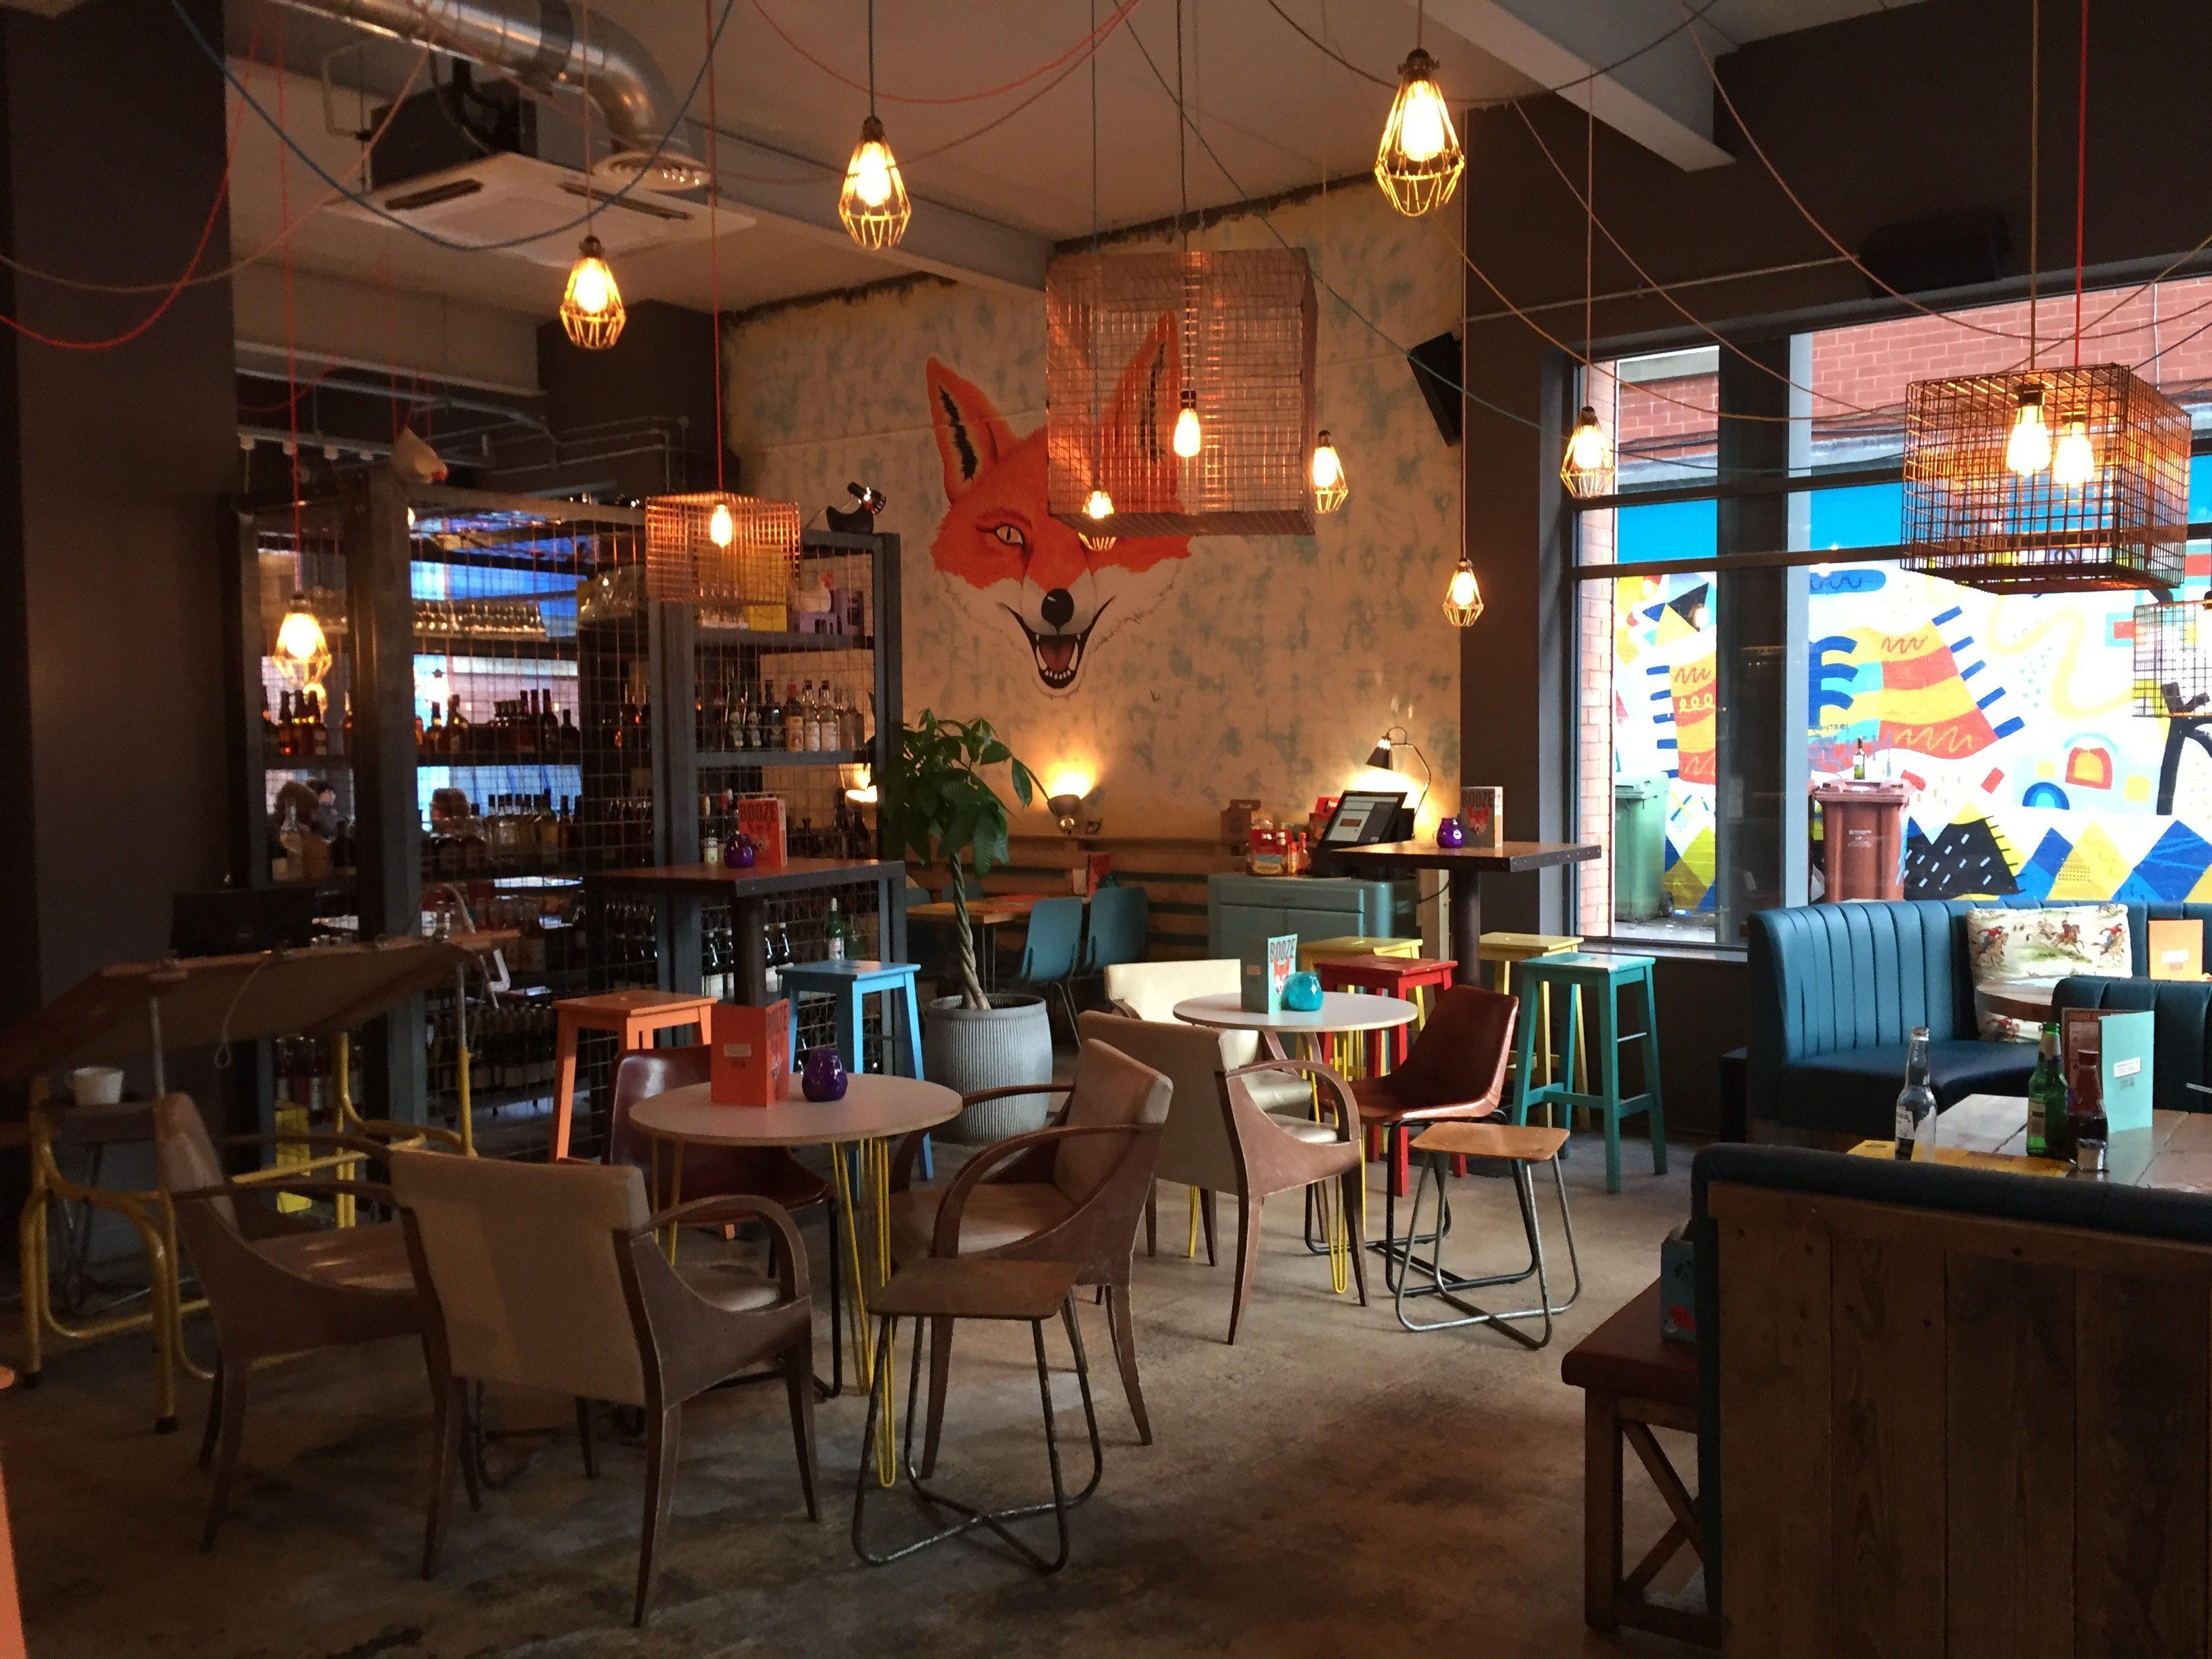 TRAVEL | De leukste, mooiste en lekkerste hotspots in Manchester